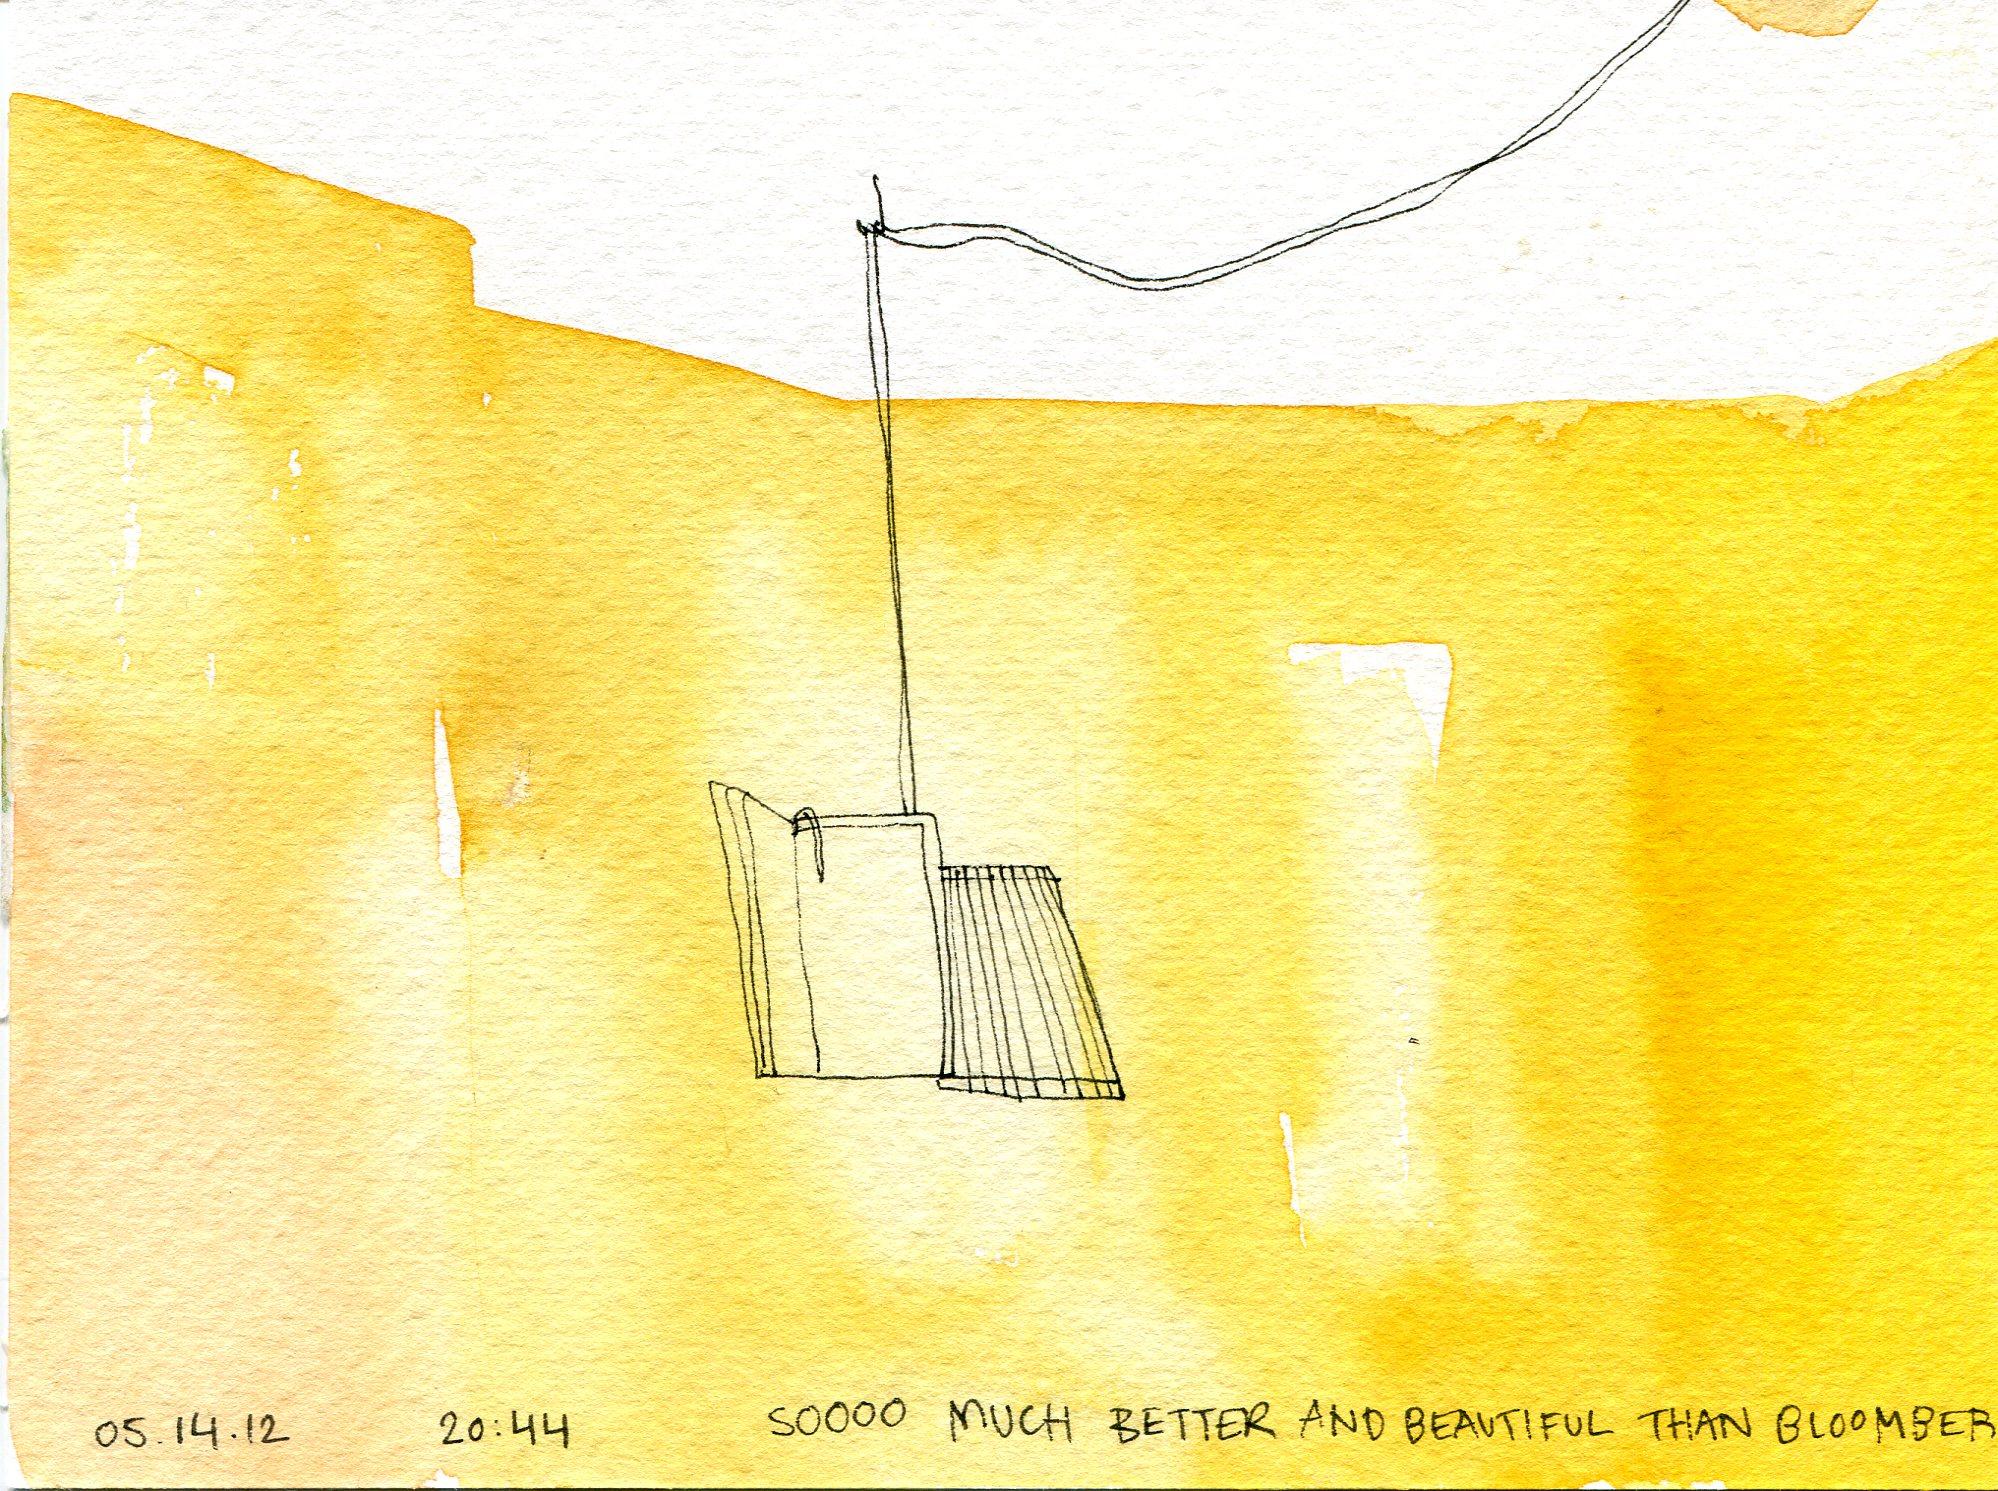 2012-05-19 drawing002.jpg